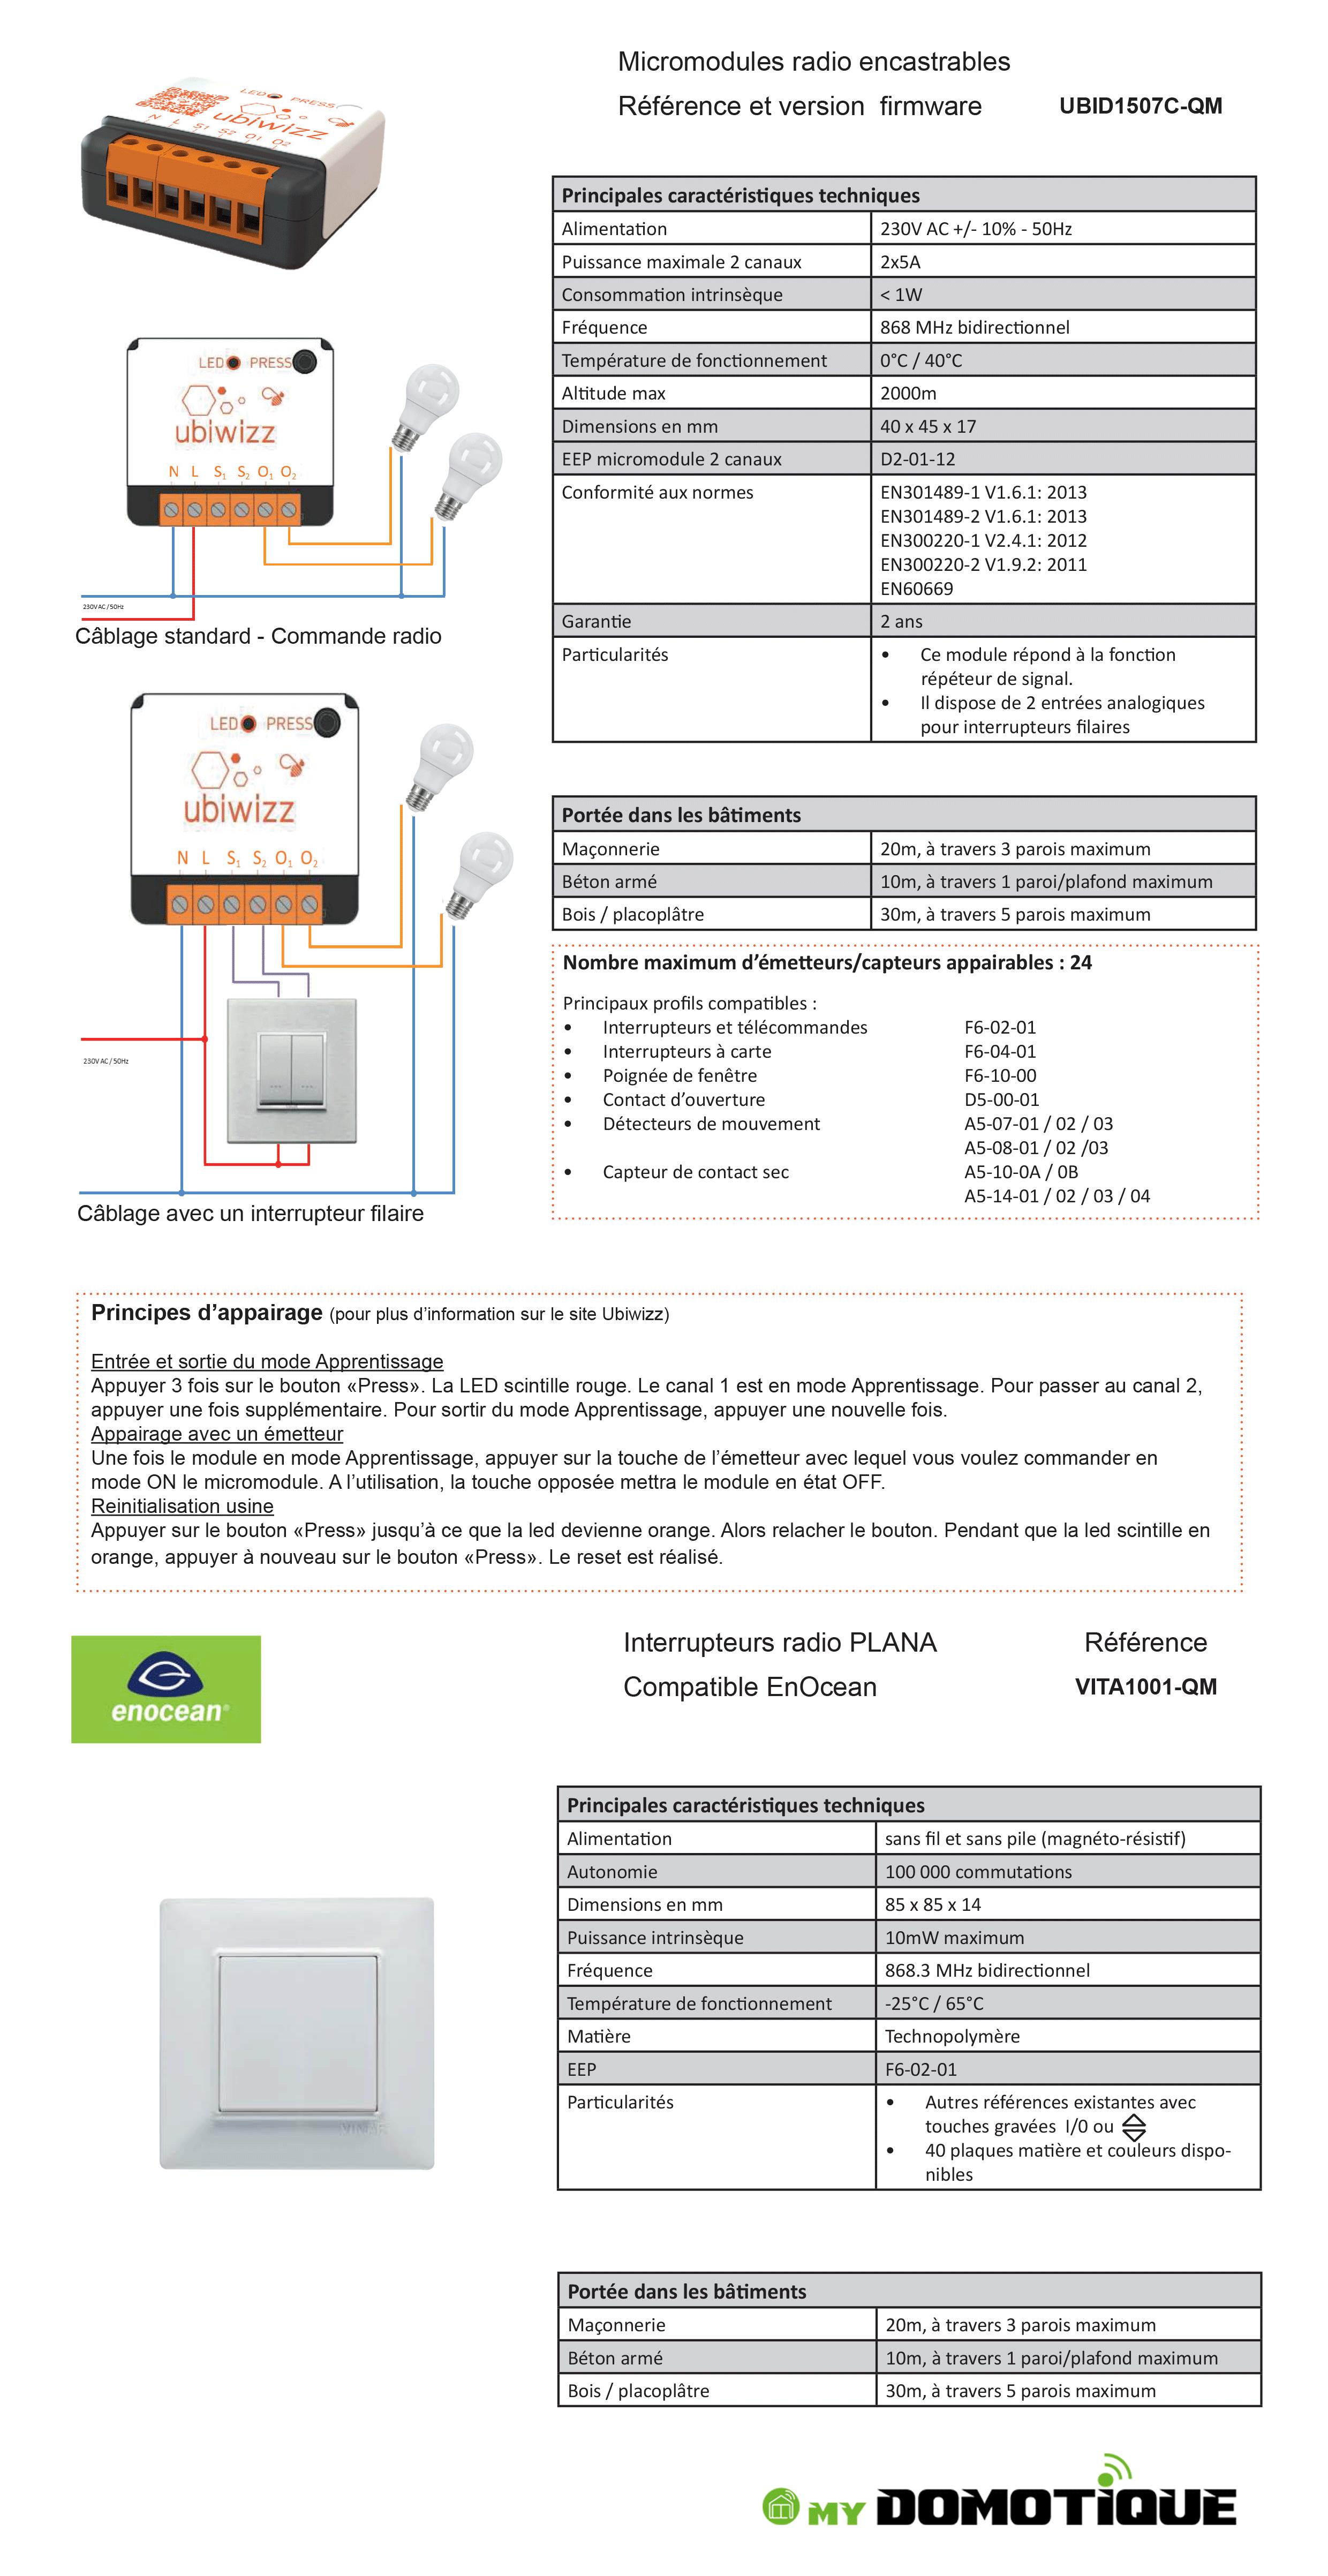 micromodules%20radio%20encastrables%20UBID1507C-QM%20Interrupteur%20Simple%20Sans%20Fil%20Plana%20VITA1001-QM.png